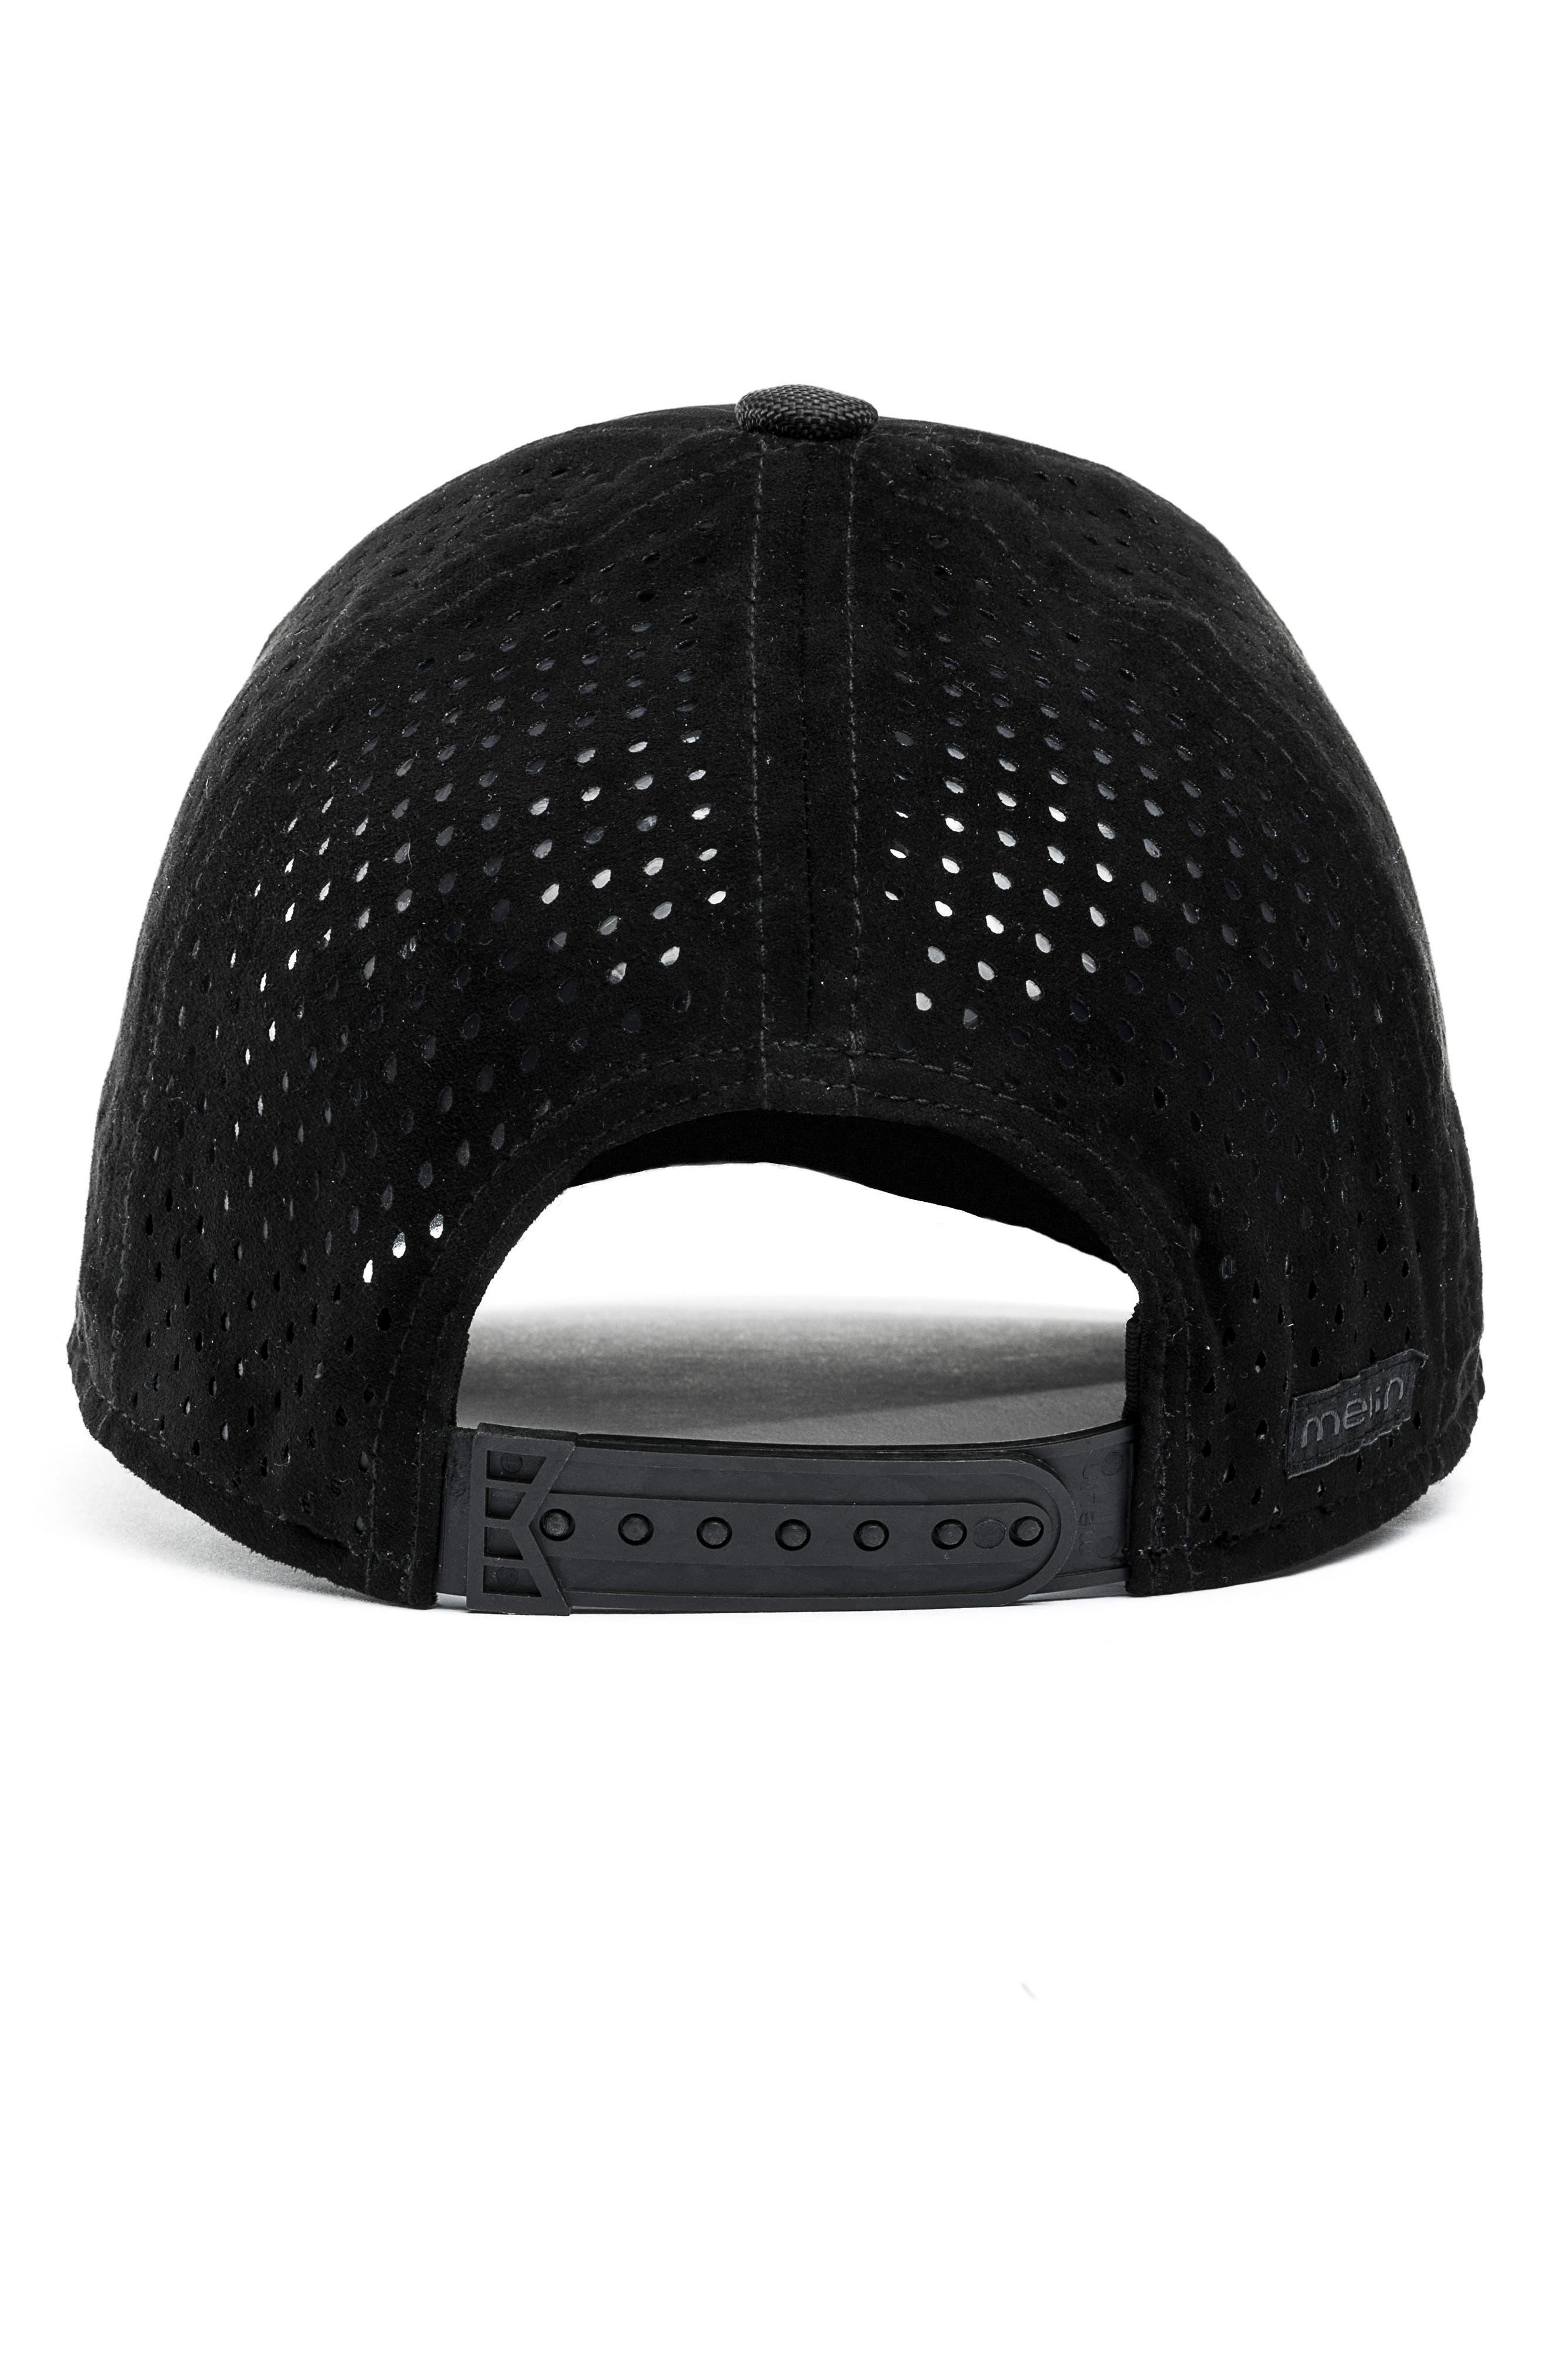 MELIN, Trooper II Snapback Baseball Cap, Alternate thumbnail 3, color, BLACK